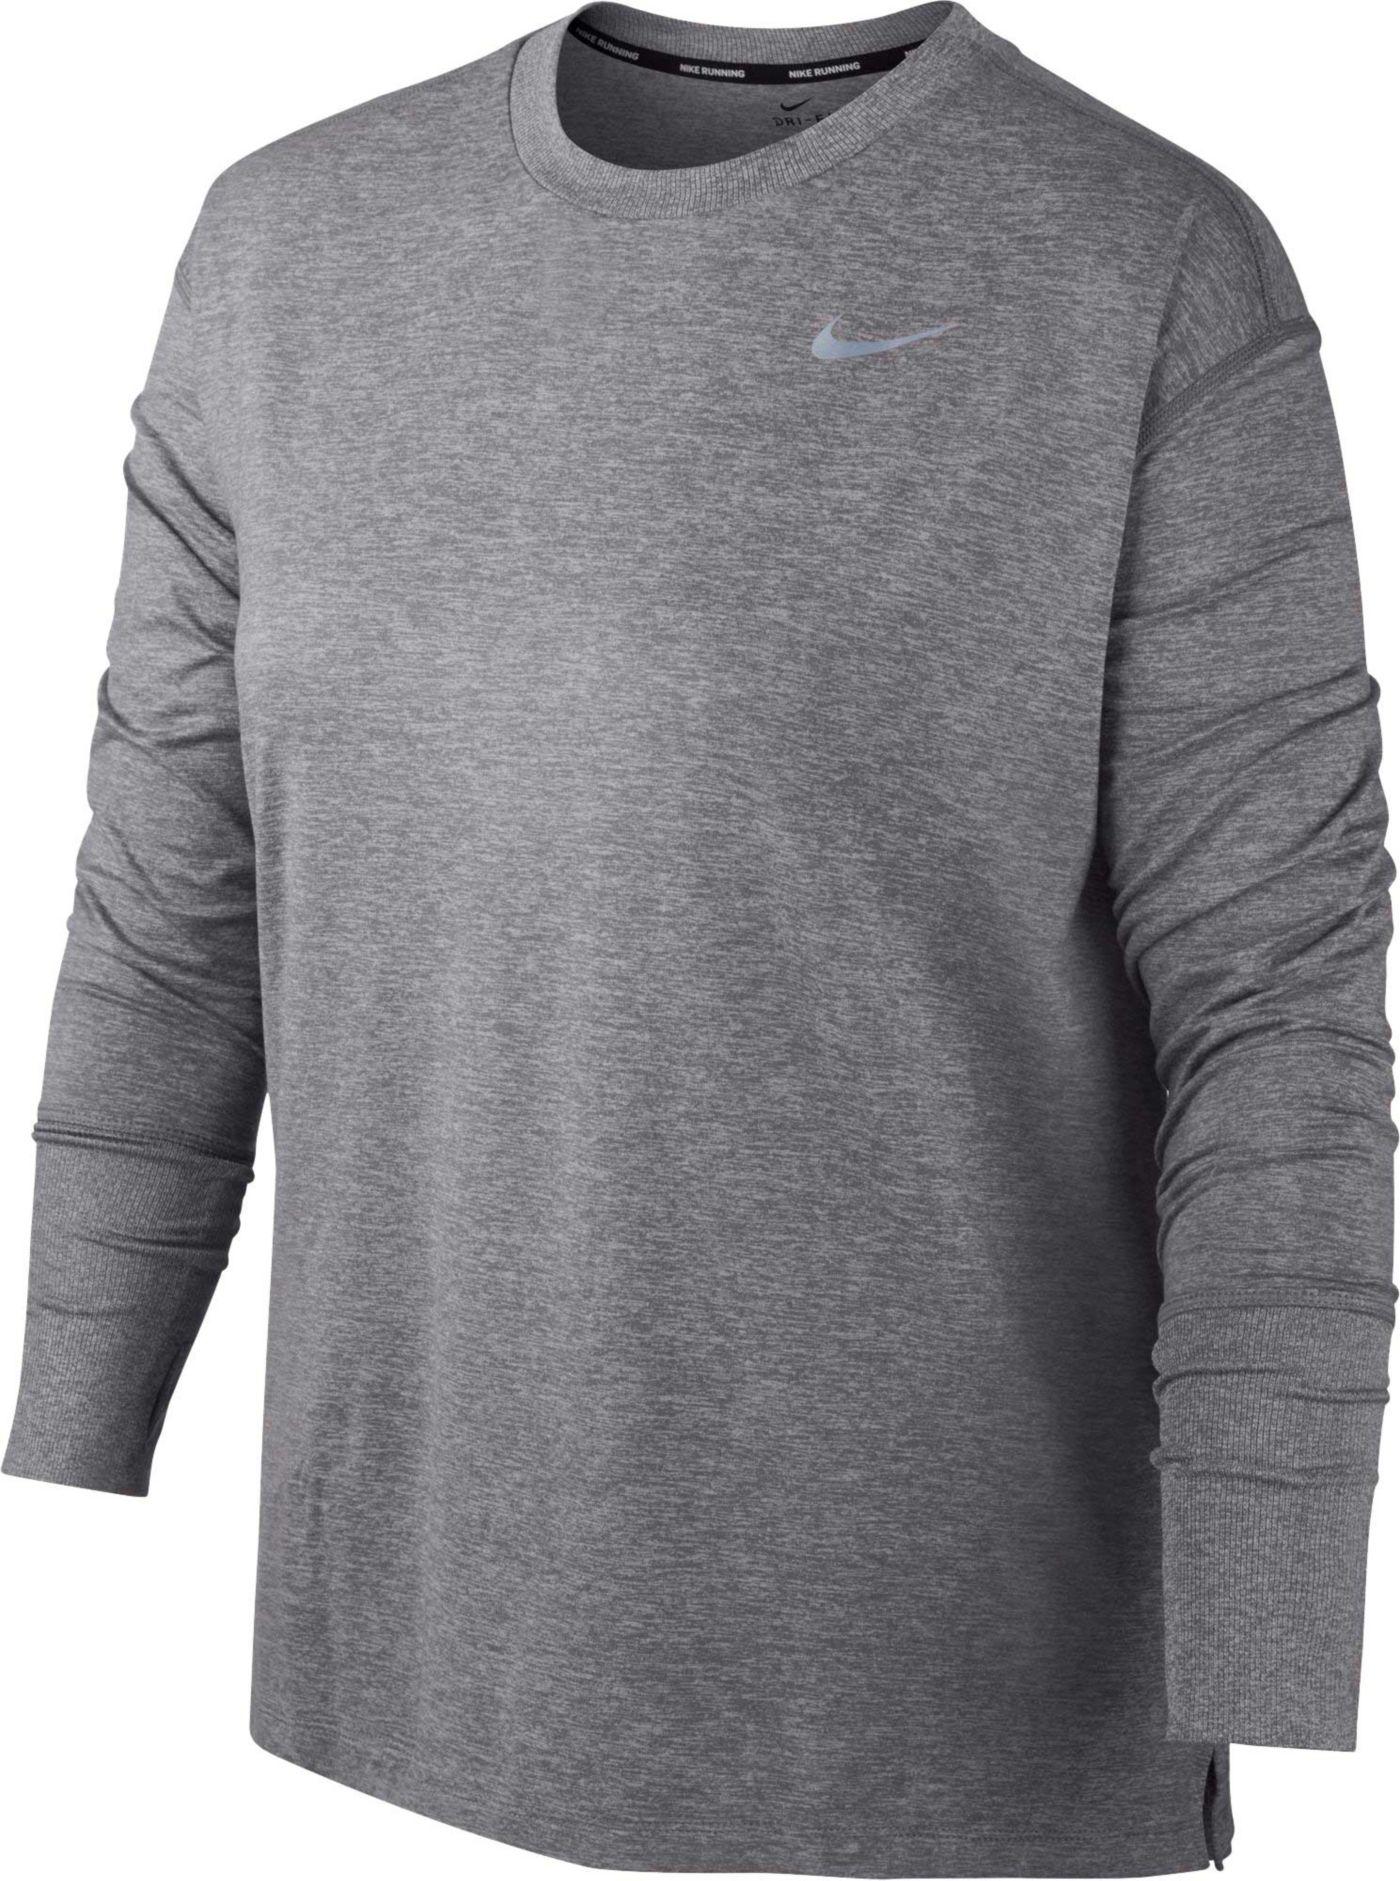 Nike Women's Plus Size Dry Element Long Sleeve Running Shirt